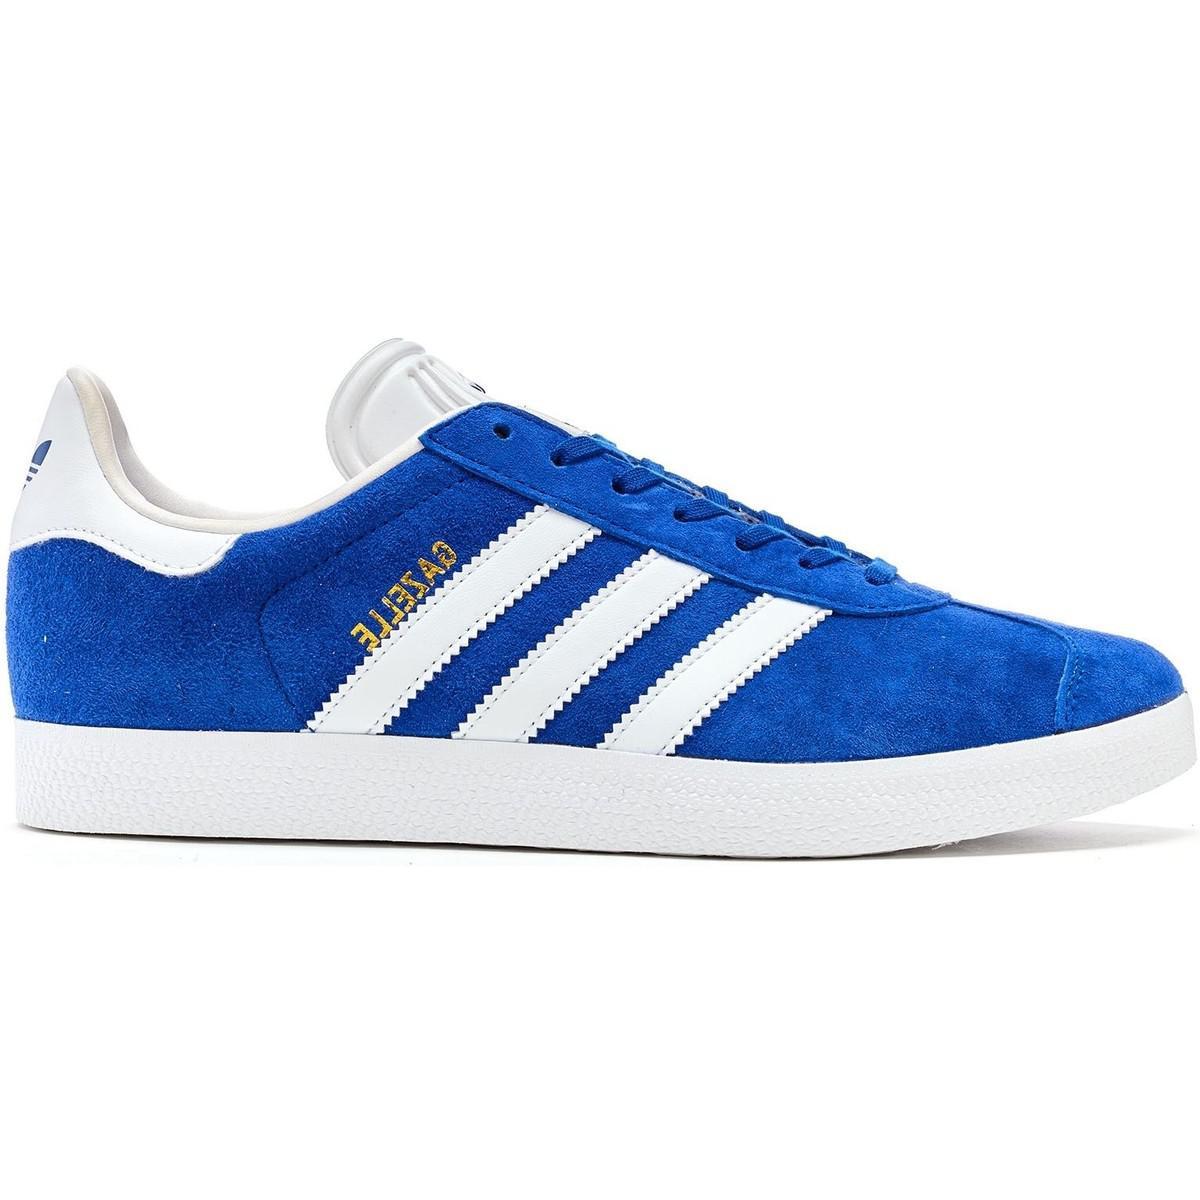 959ff554794f Adidas Originals Gazelle Suede Trainers In Collegiate Royal Blue Whi ...